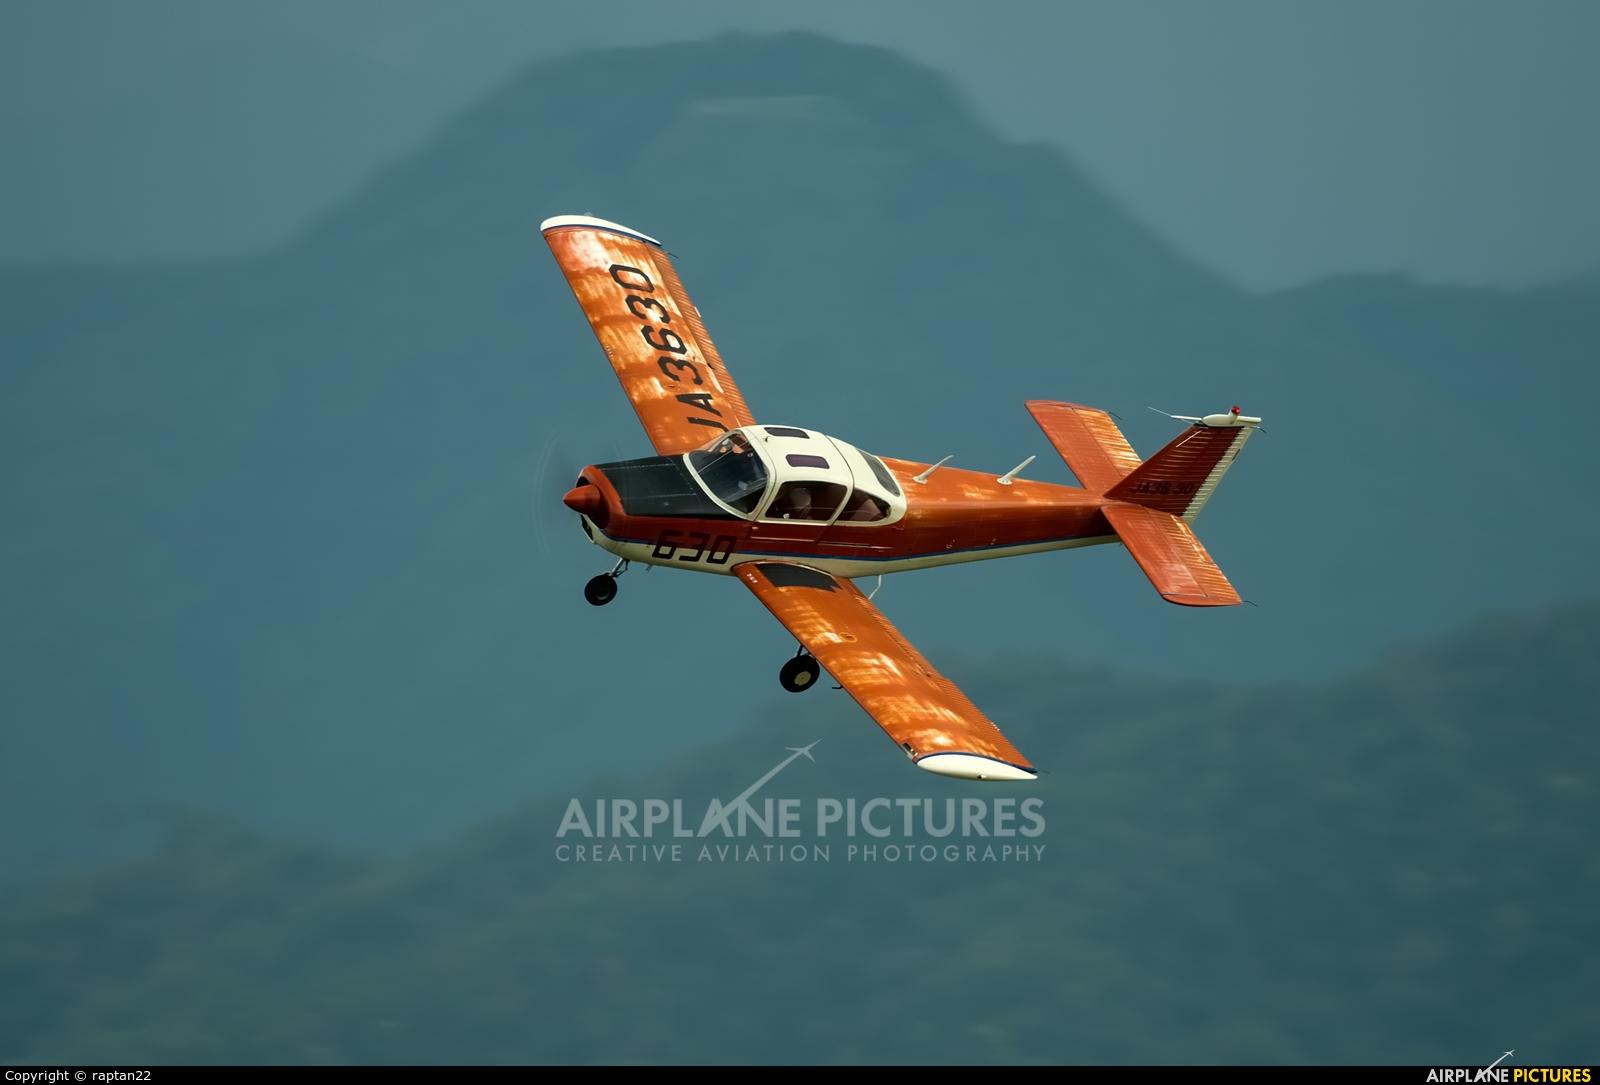 Private JA3630 aircraft at Tajima